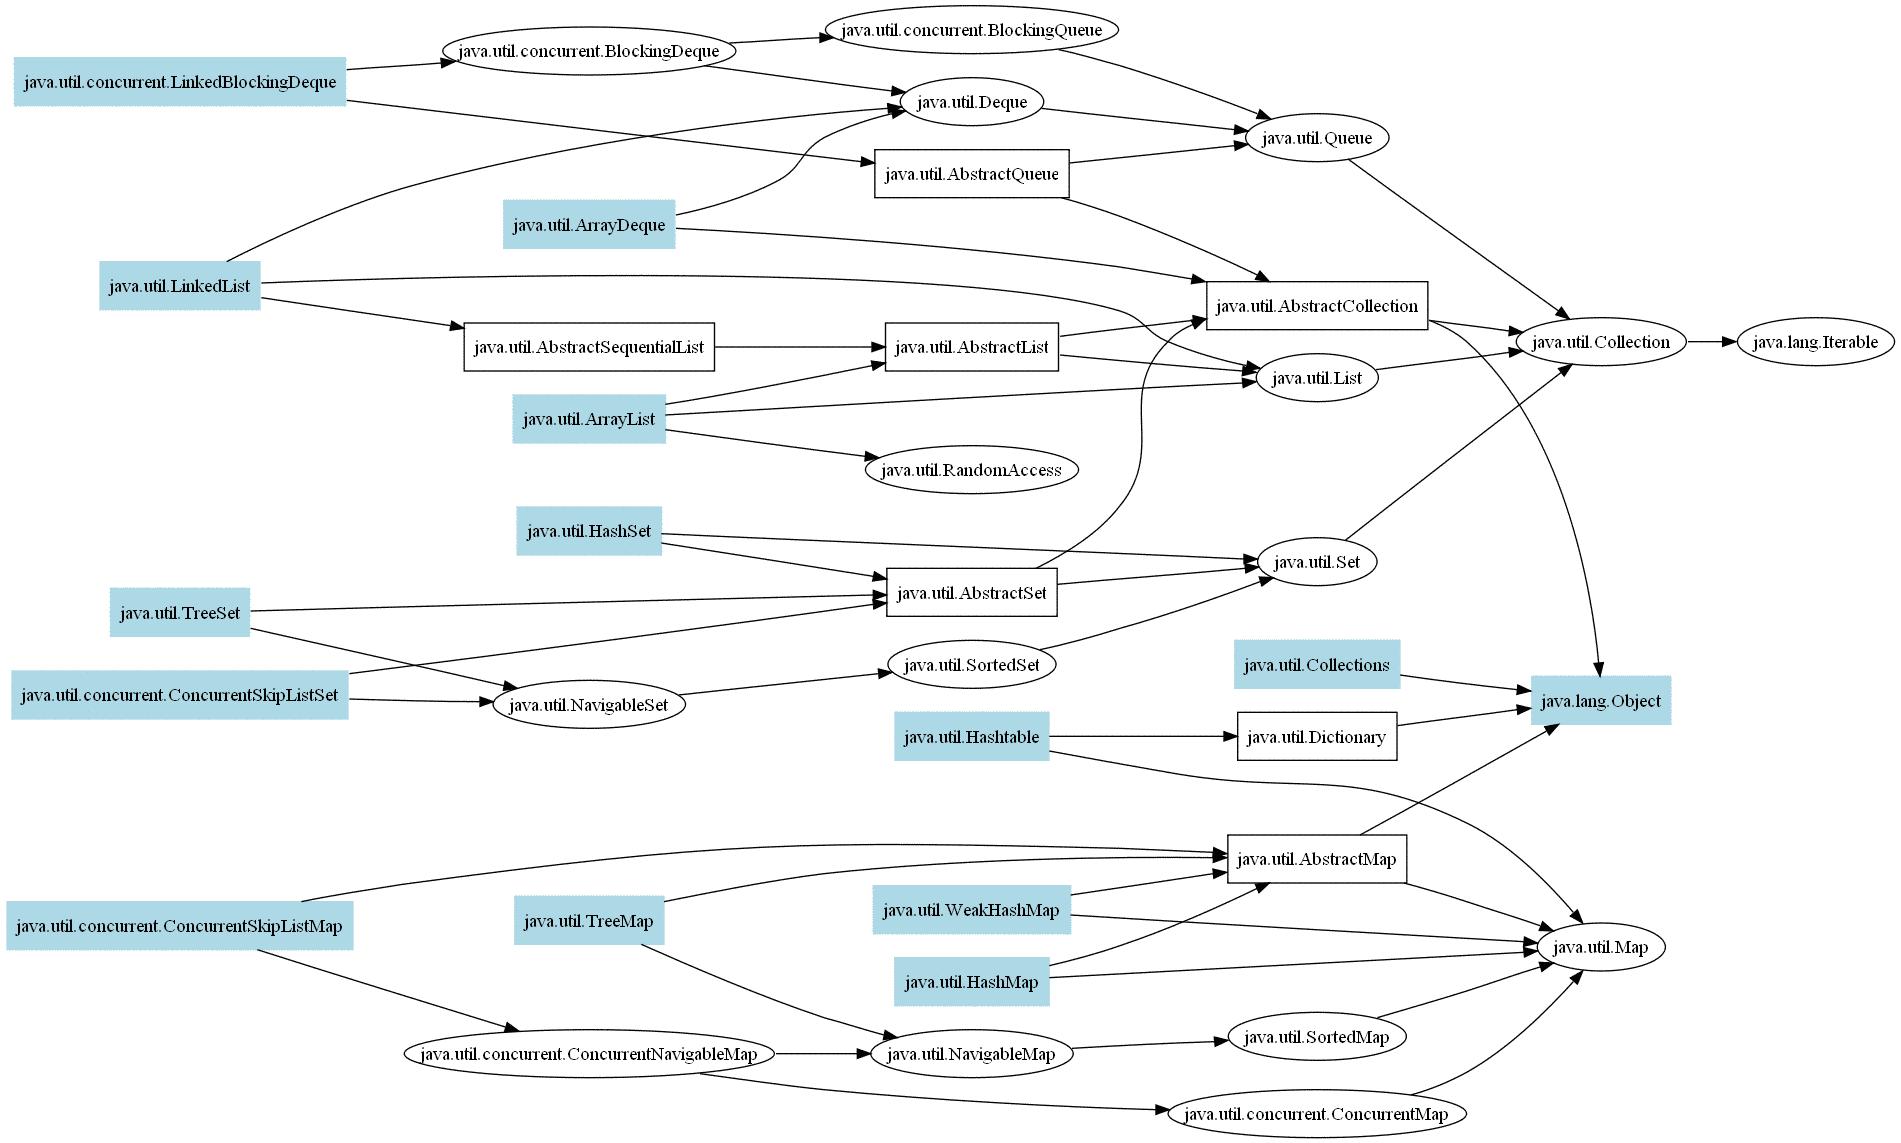 Подготовка к экзамену Oracle Java SE 7 Programmer II (1Z0 804)